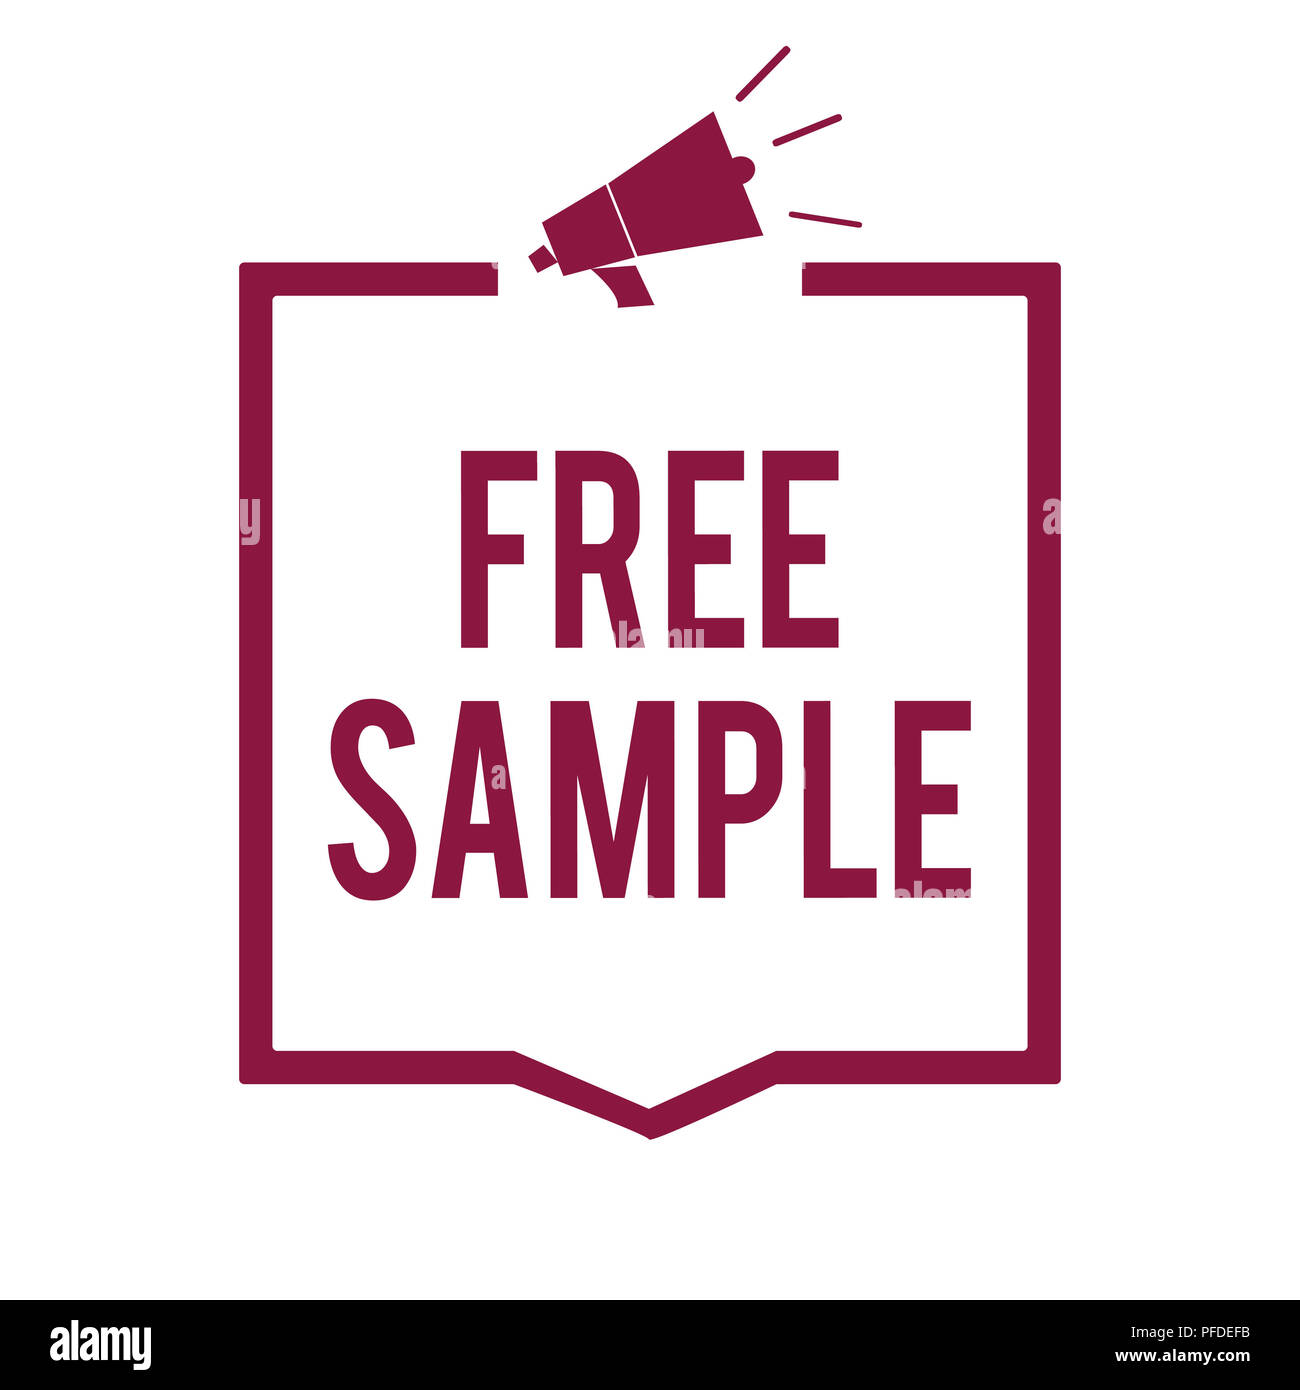 Free Sample Stock Photos & Free Sample Stock Images - Alamy